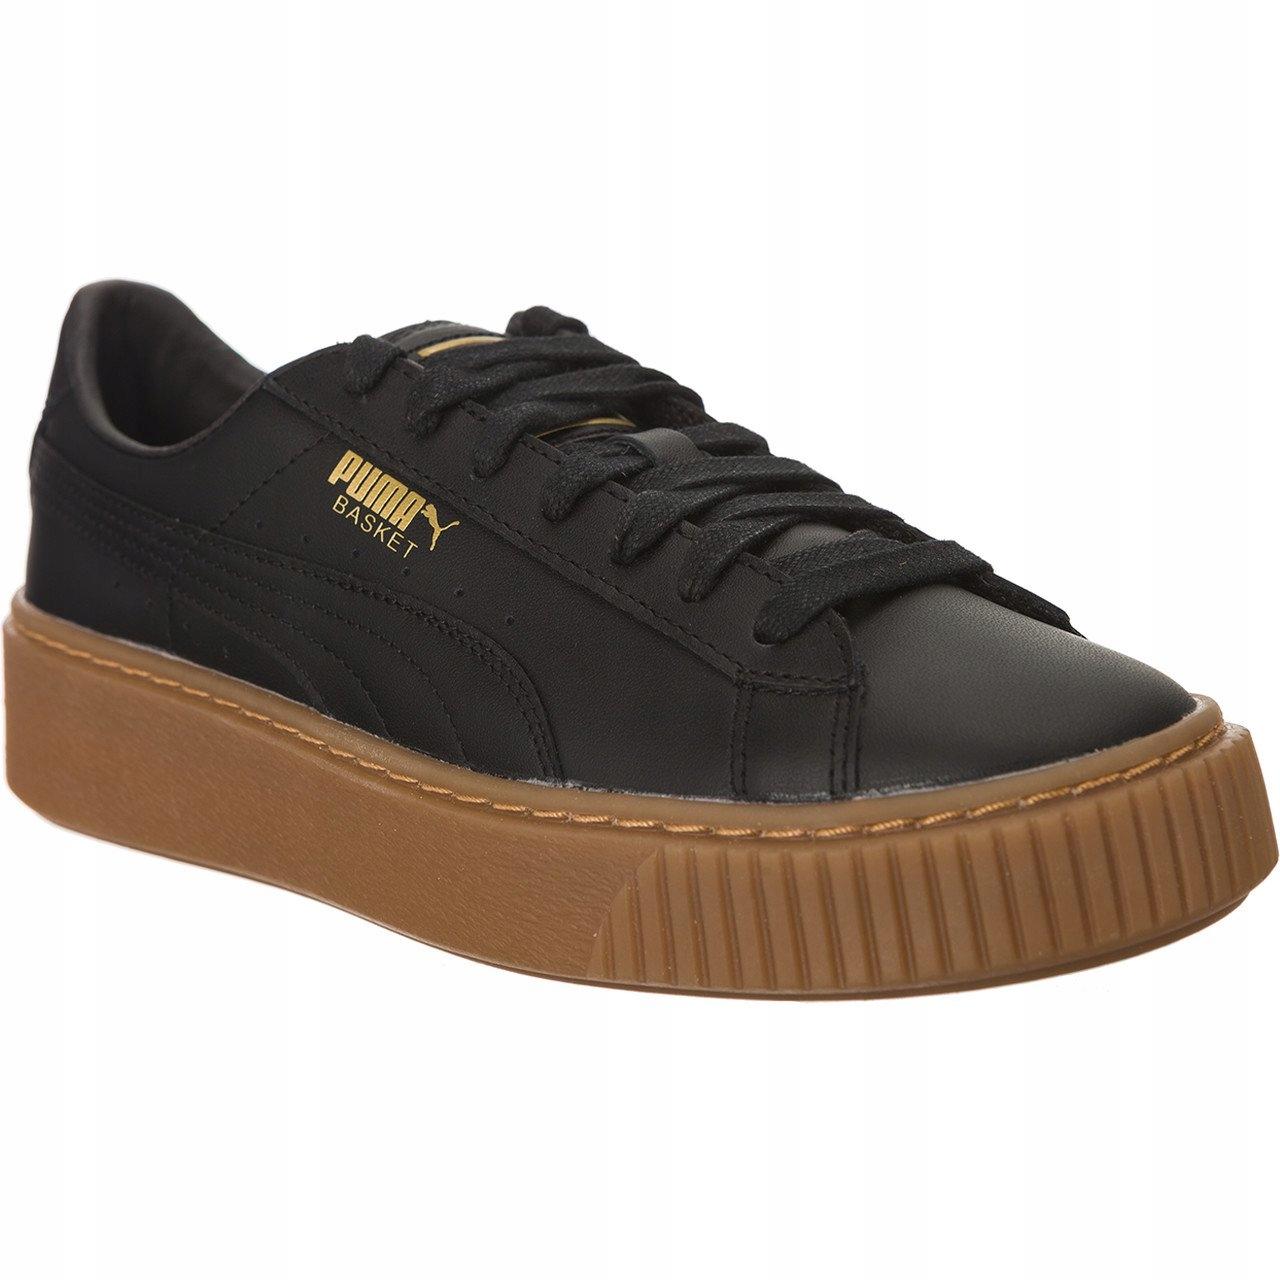 9c5a9f6b48c2d PUMA BASKET PLATFORM CORE (38,5) Damskie Sneakersy - 7588096015 ...